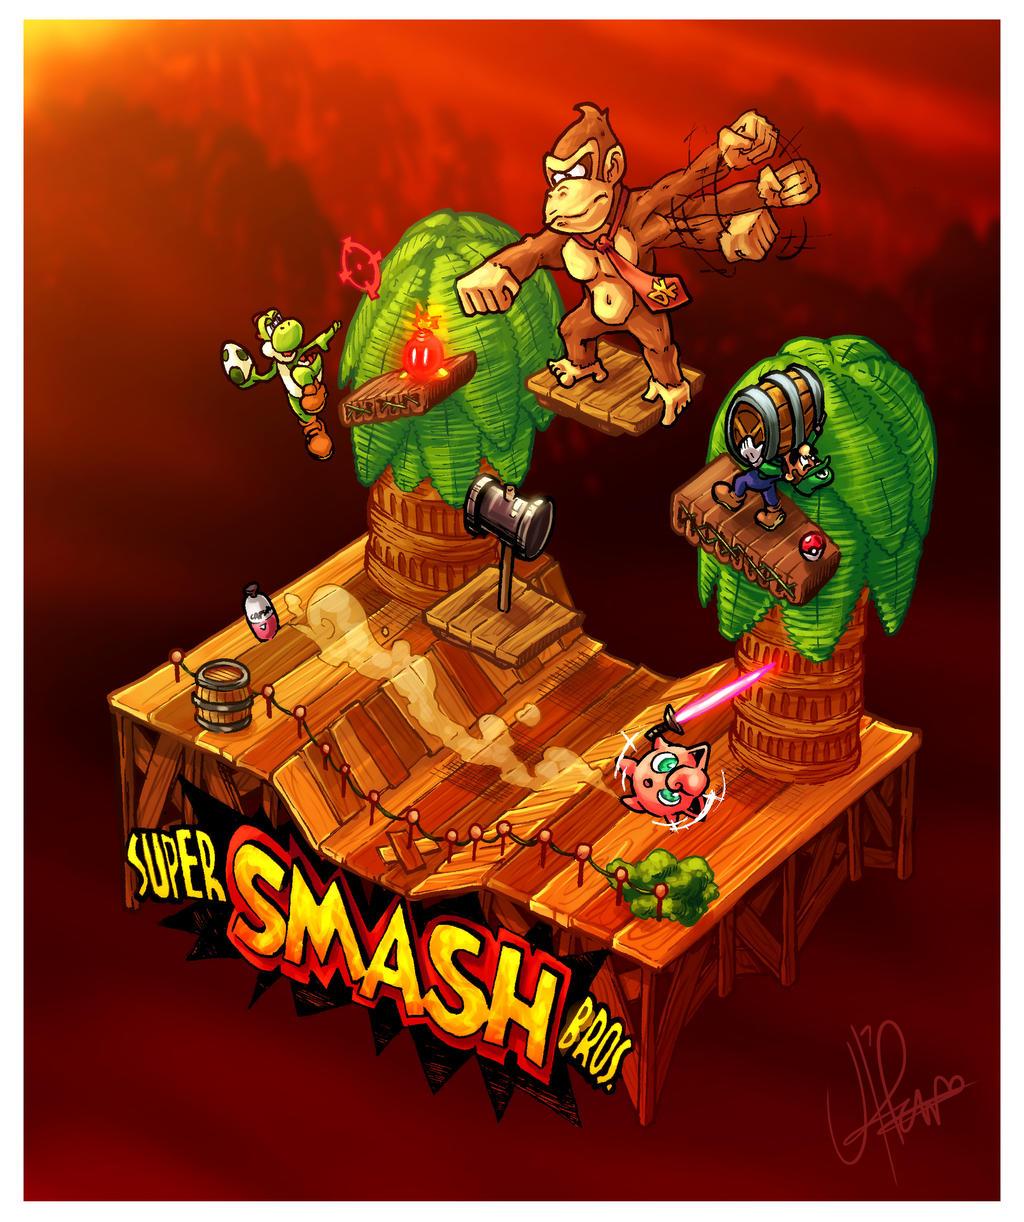 Isometric Nostalgia: Super Smash Bros. 64